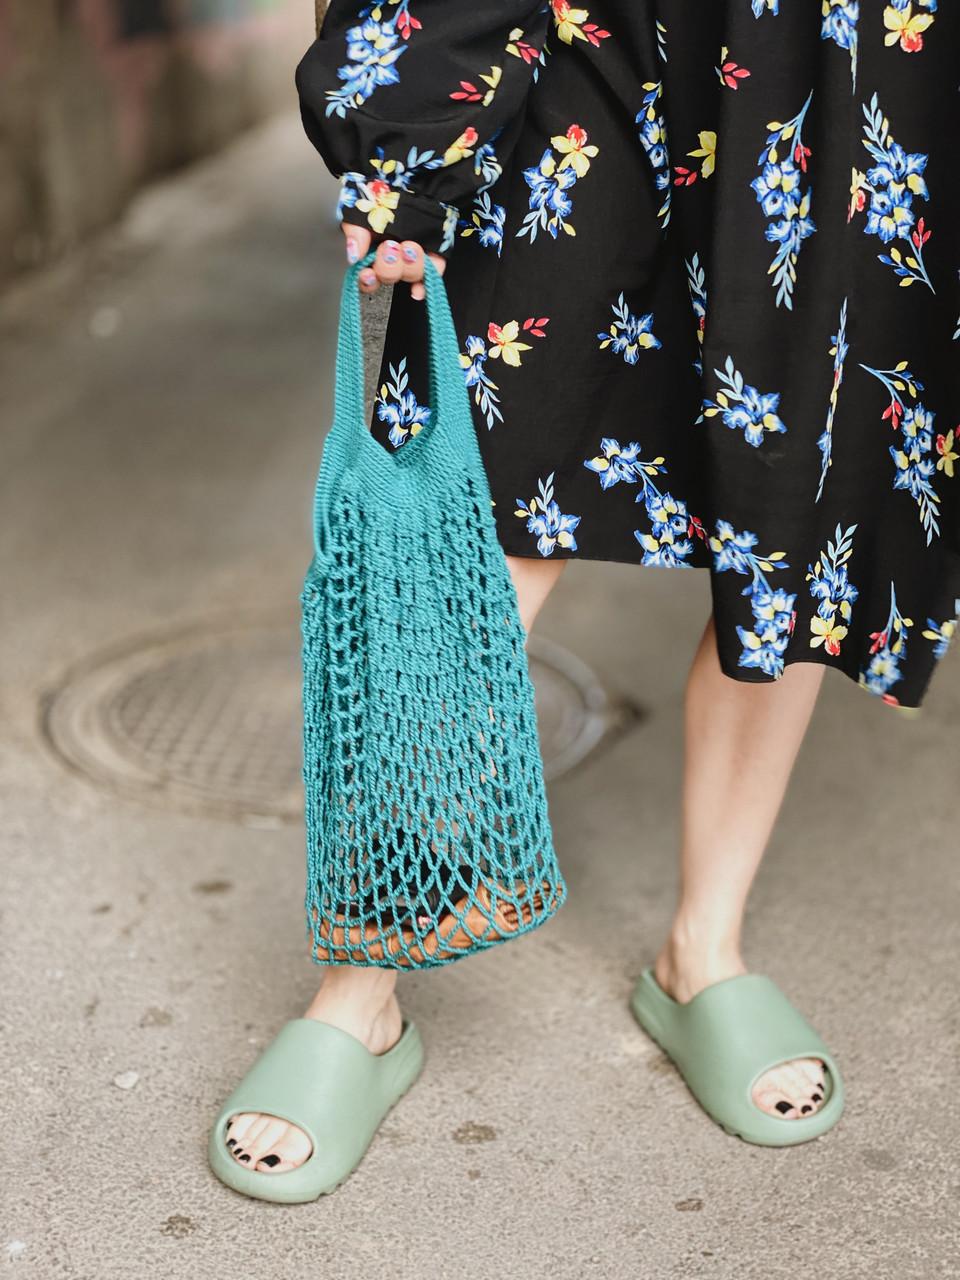 Авоська Maybe, сумка-авоська, авоськи оптом, сумка для продуктов, сумка сетка, сетчатая сумка - фото 3